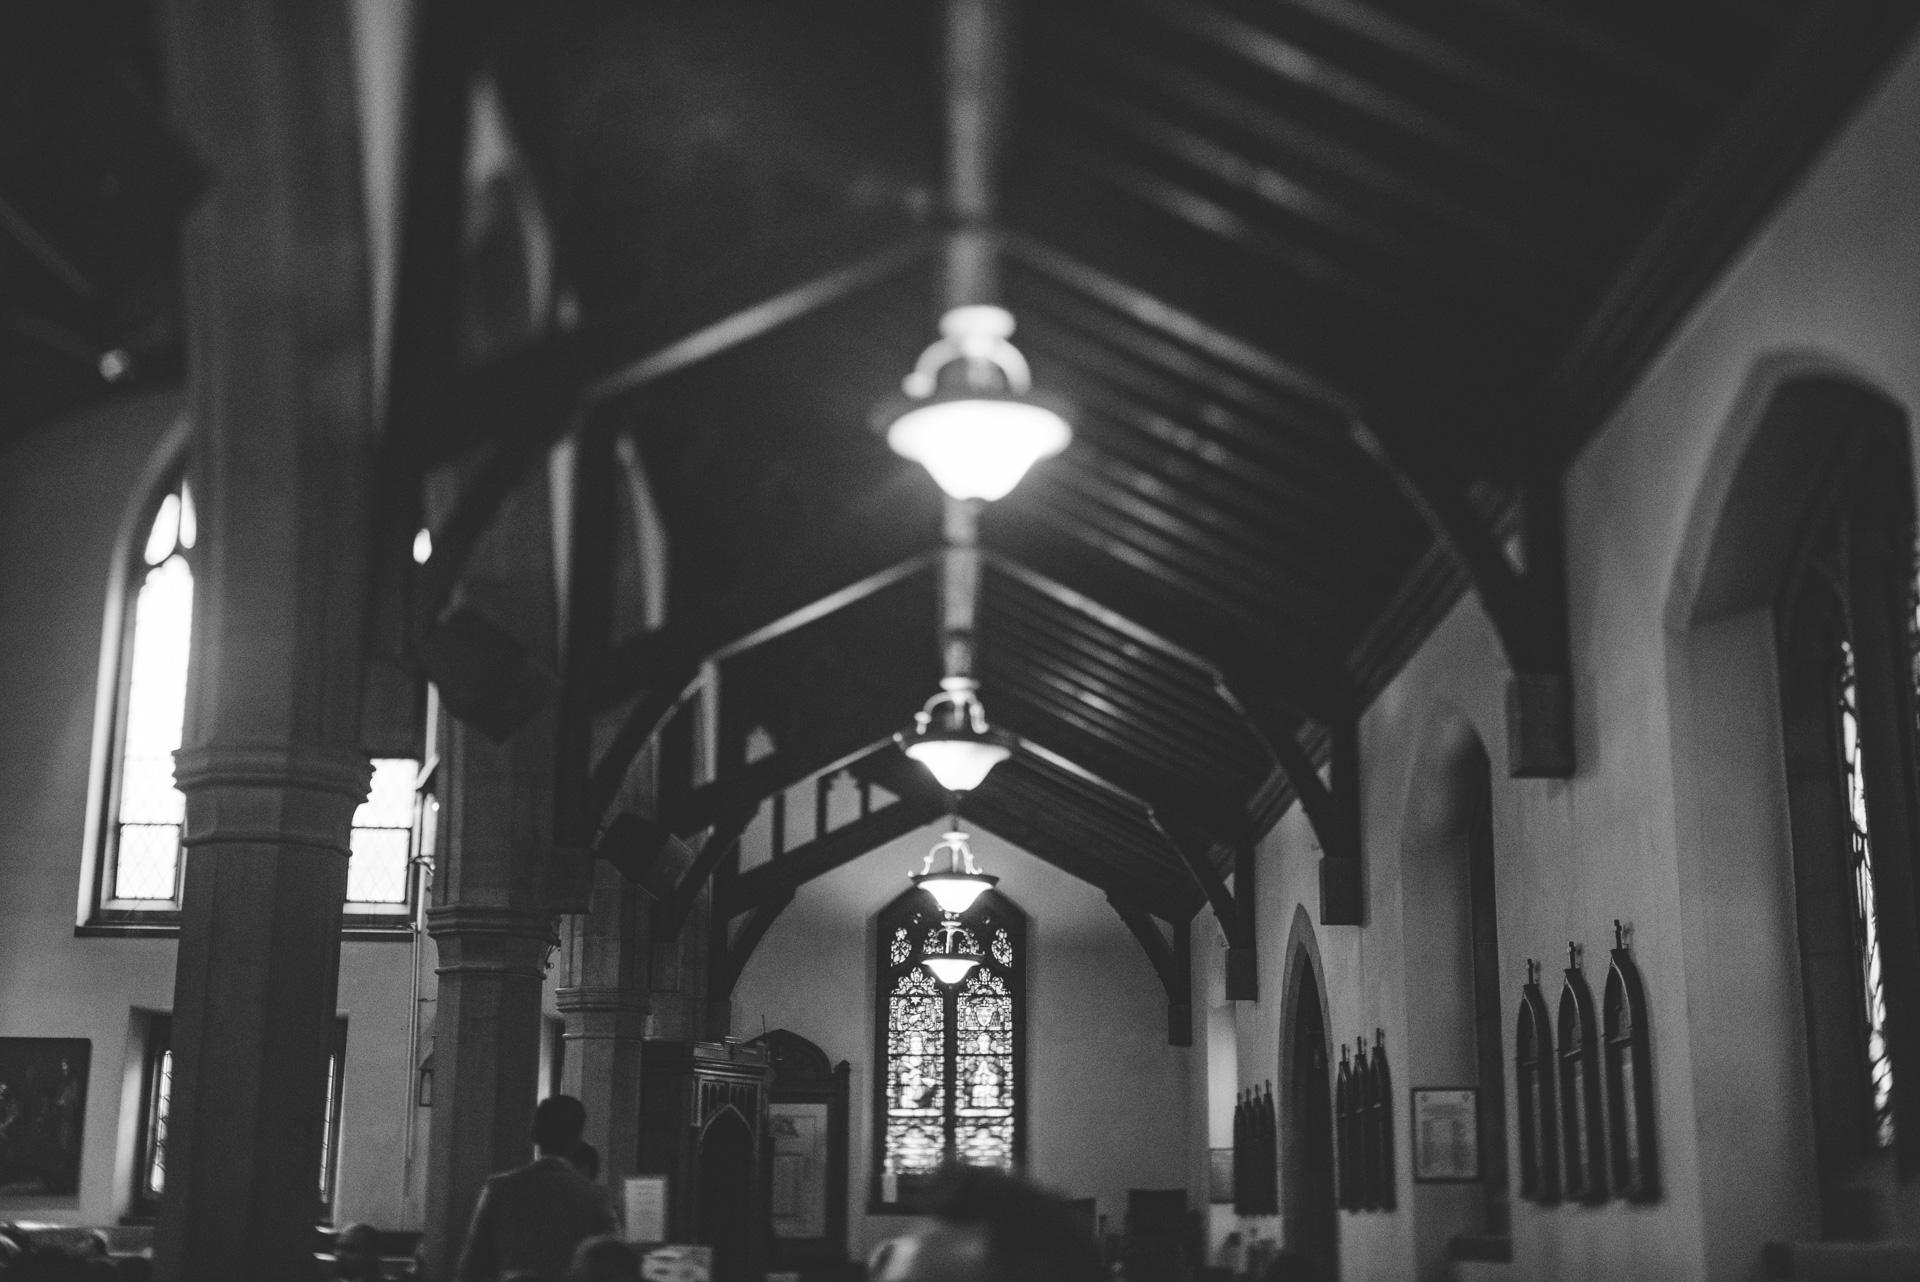 st. aquinas toronto wedding church